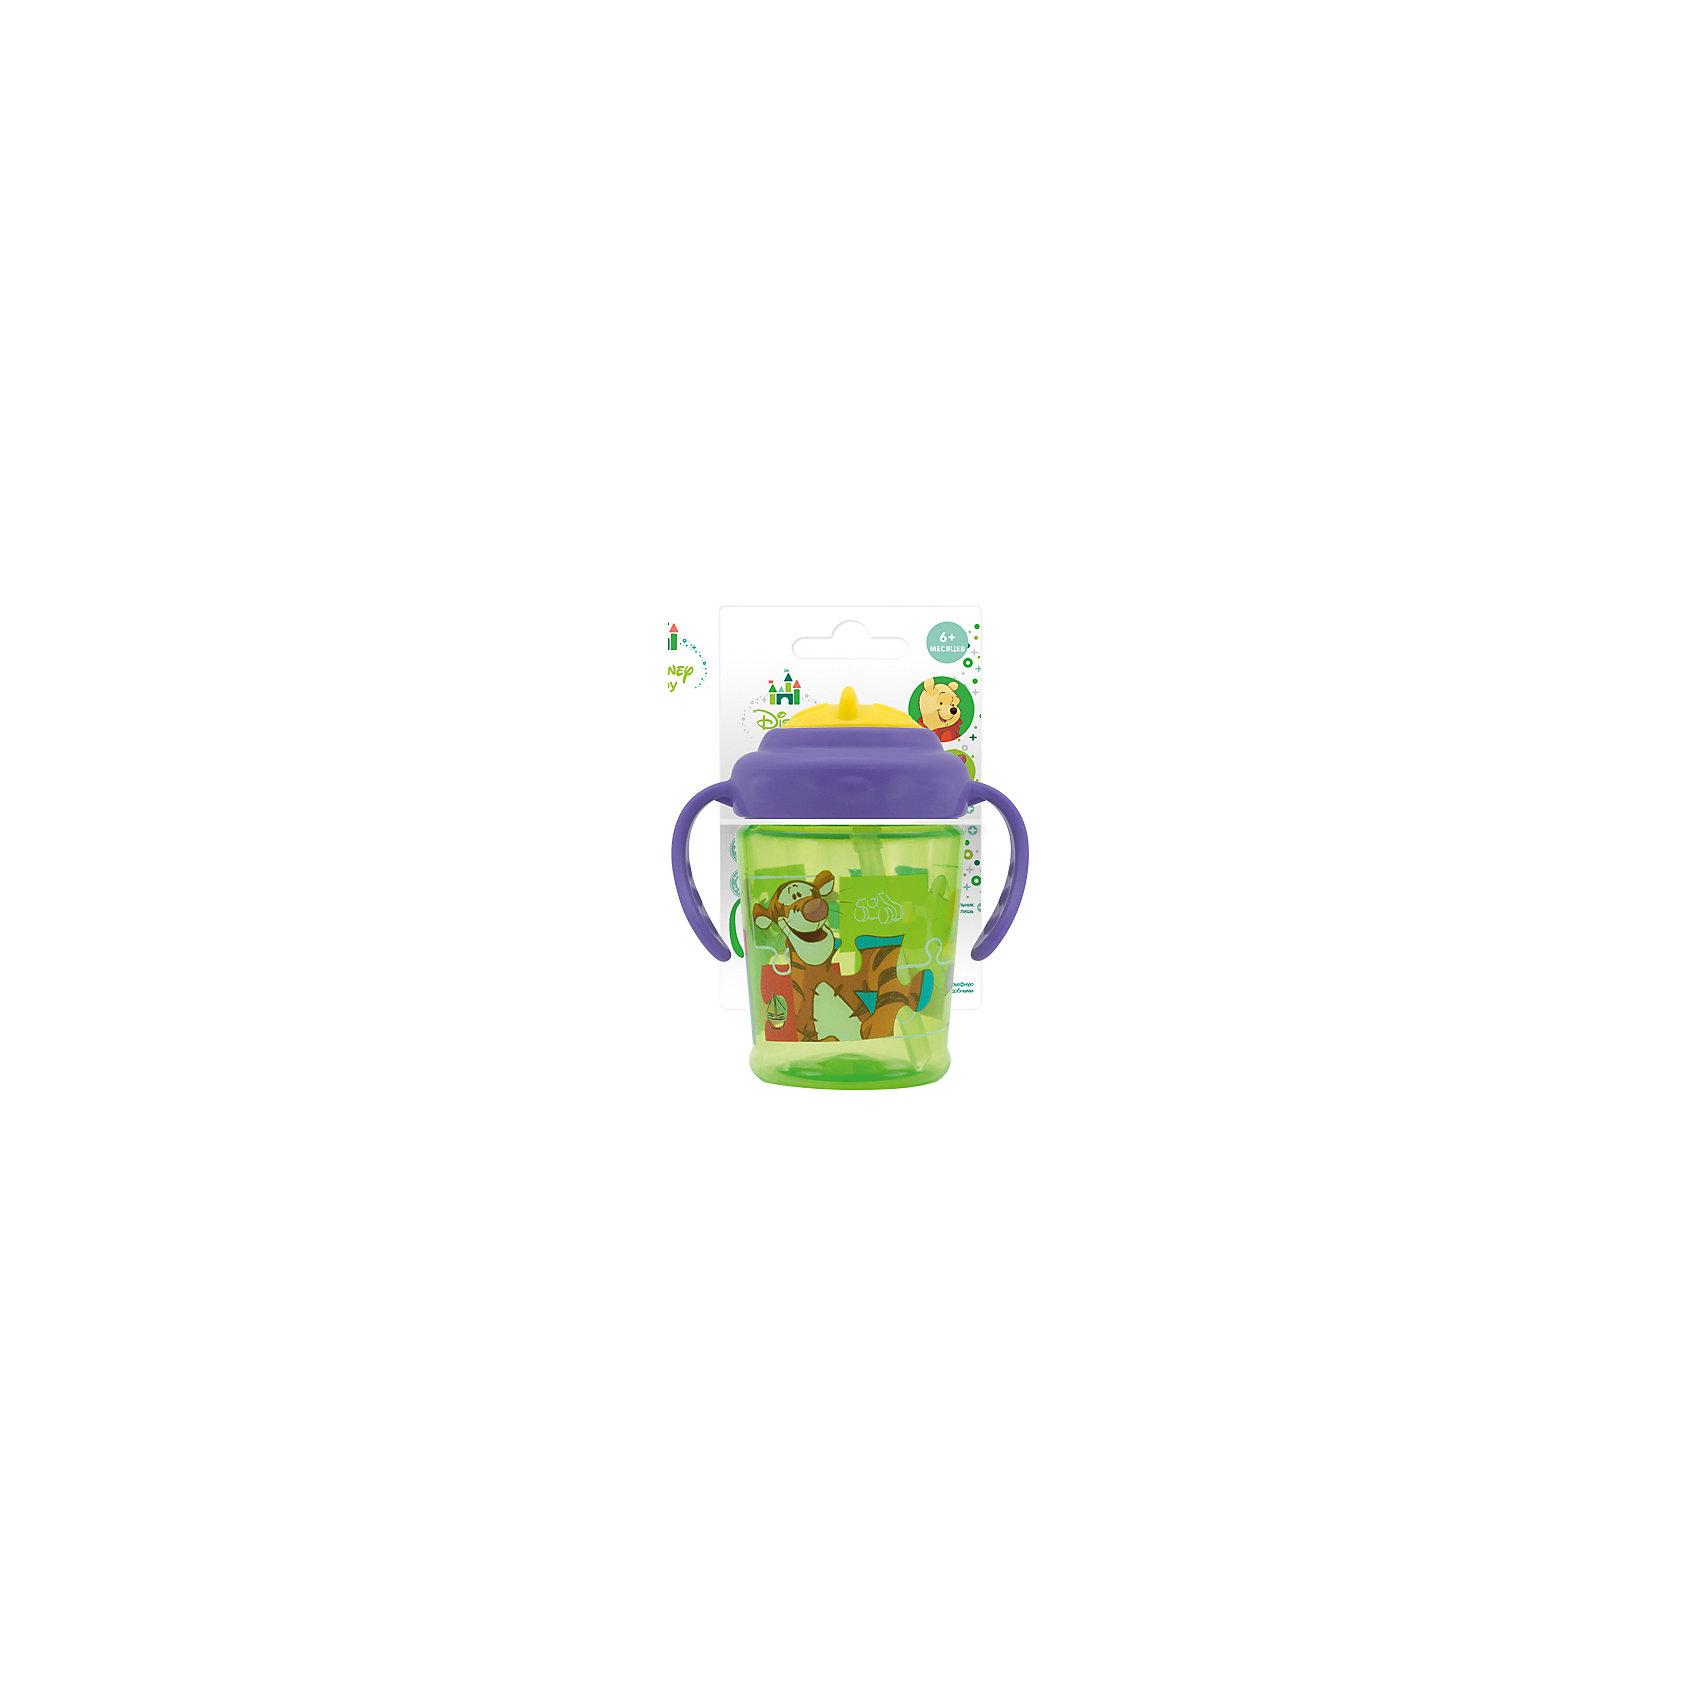 LUBBY Поильник Мои друзья Тигруля и Винни  DISNEY  от 6 мес., 250 мл., LUBBY, зеленый pigeon чашка поильник mag mag с трубочкой зеленый с 8 мес 200 мл